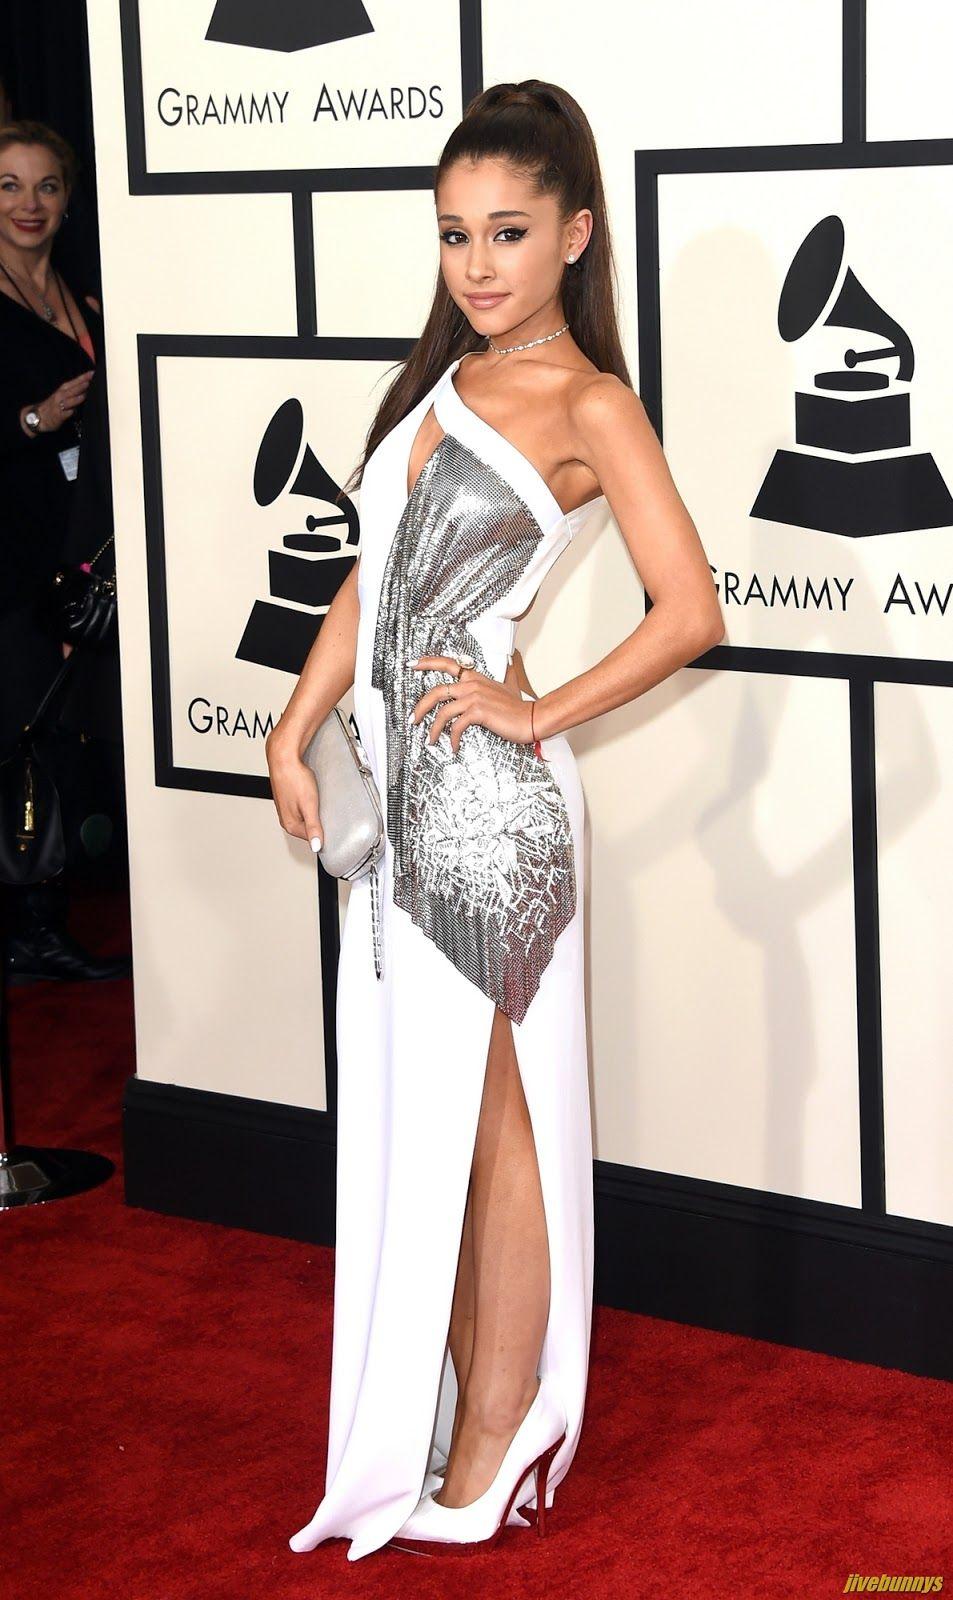 Pin On Ariana Granda